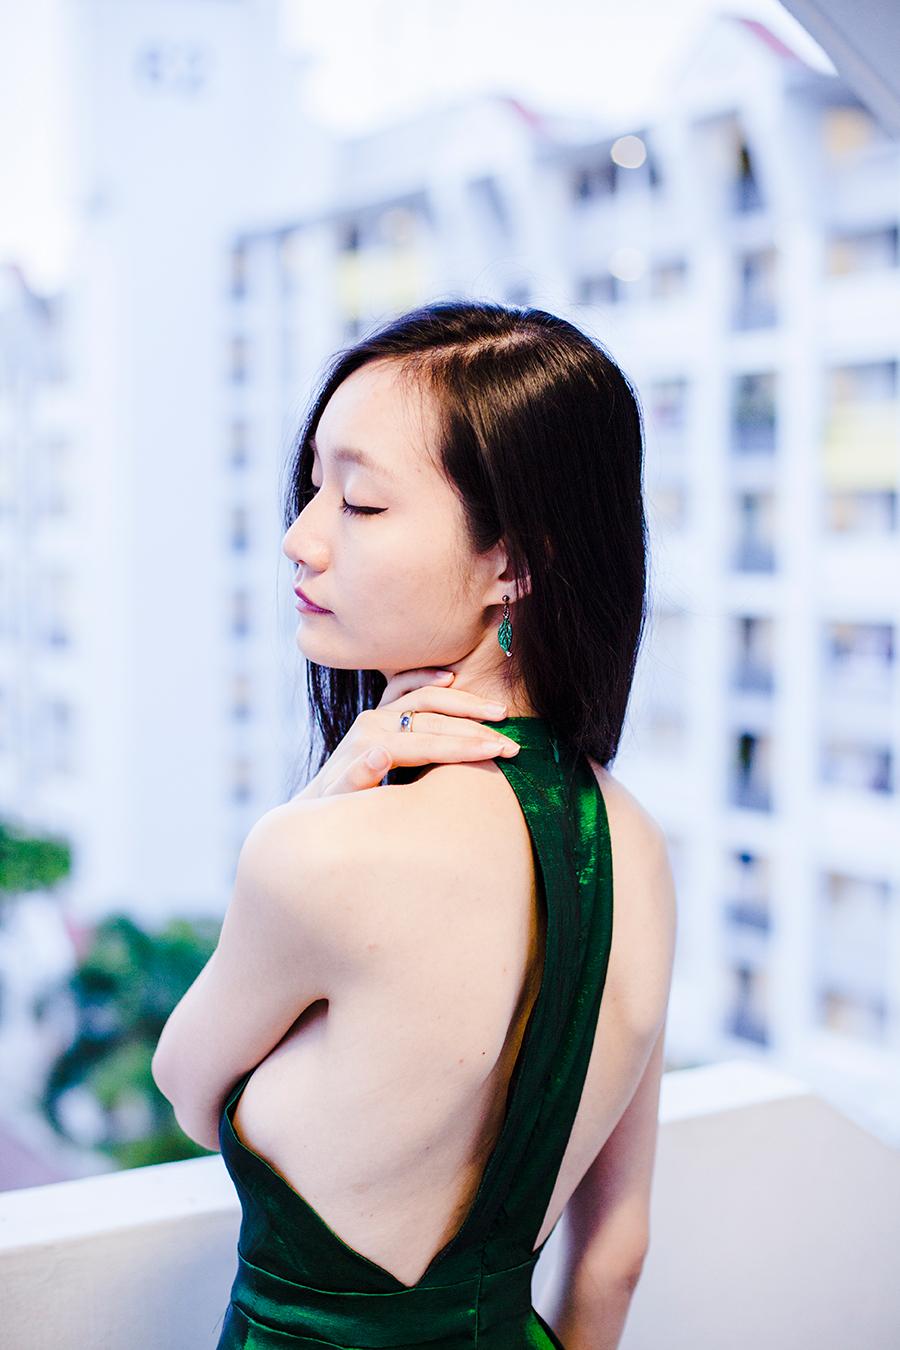 Green satin backless dress from CNDirect, Dressin green leaf earrings.